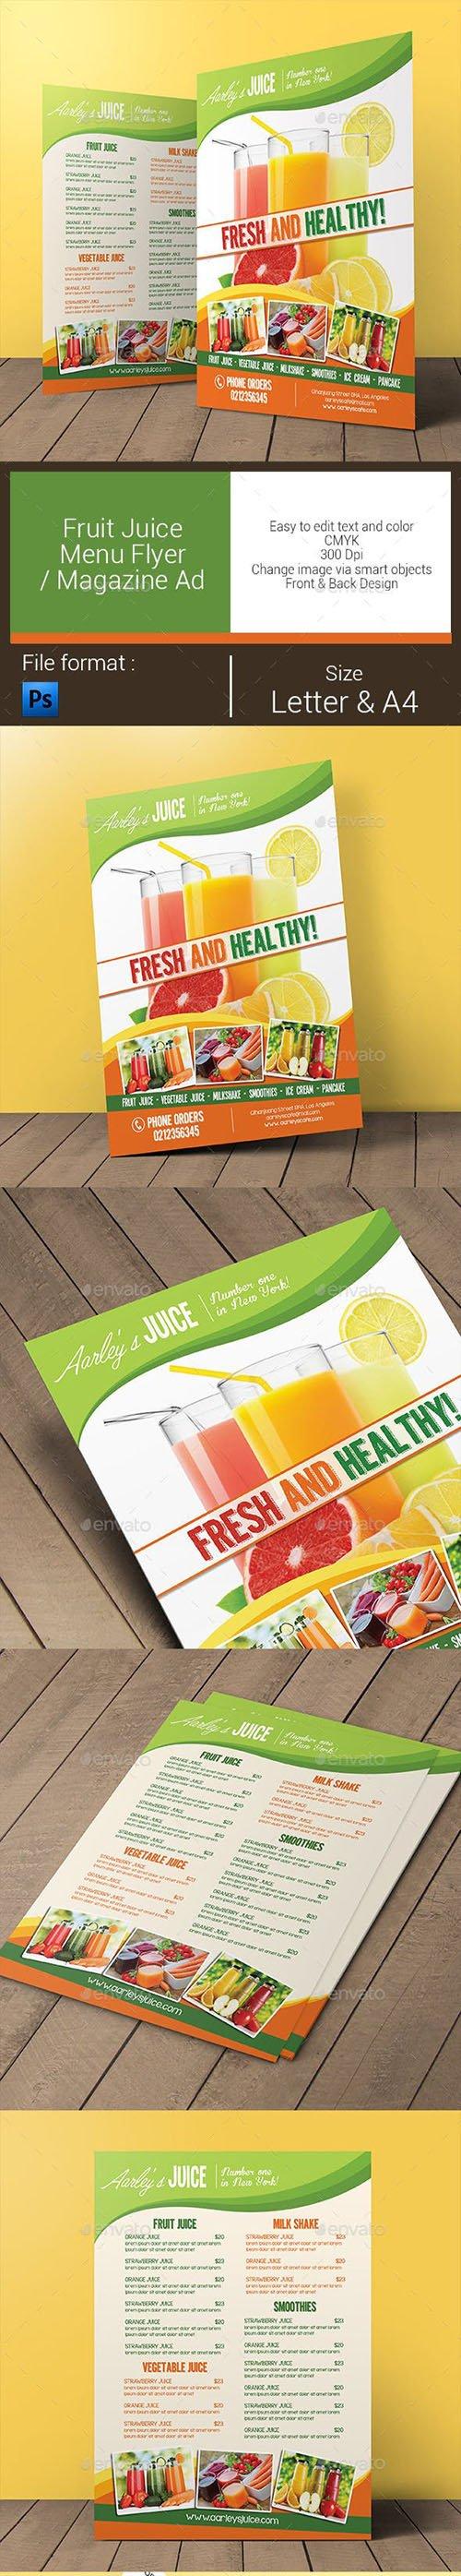 GR - Fruit Juice Menu Flyer / Magazine Ad 11027875